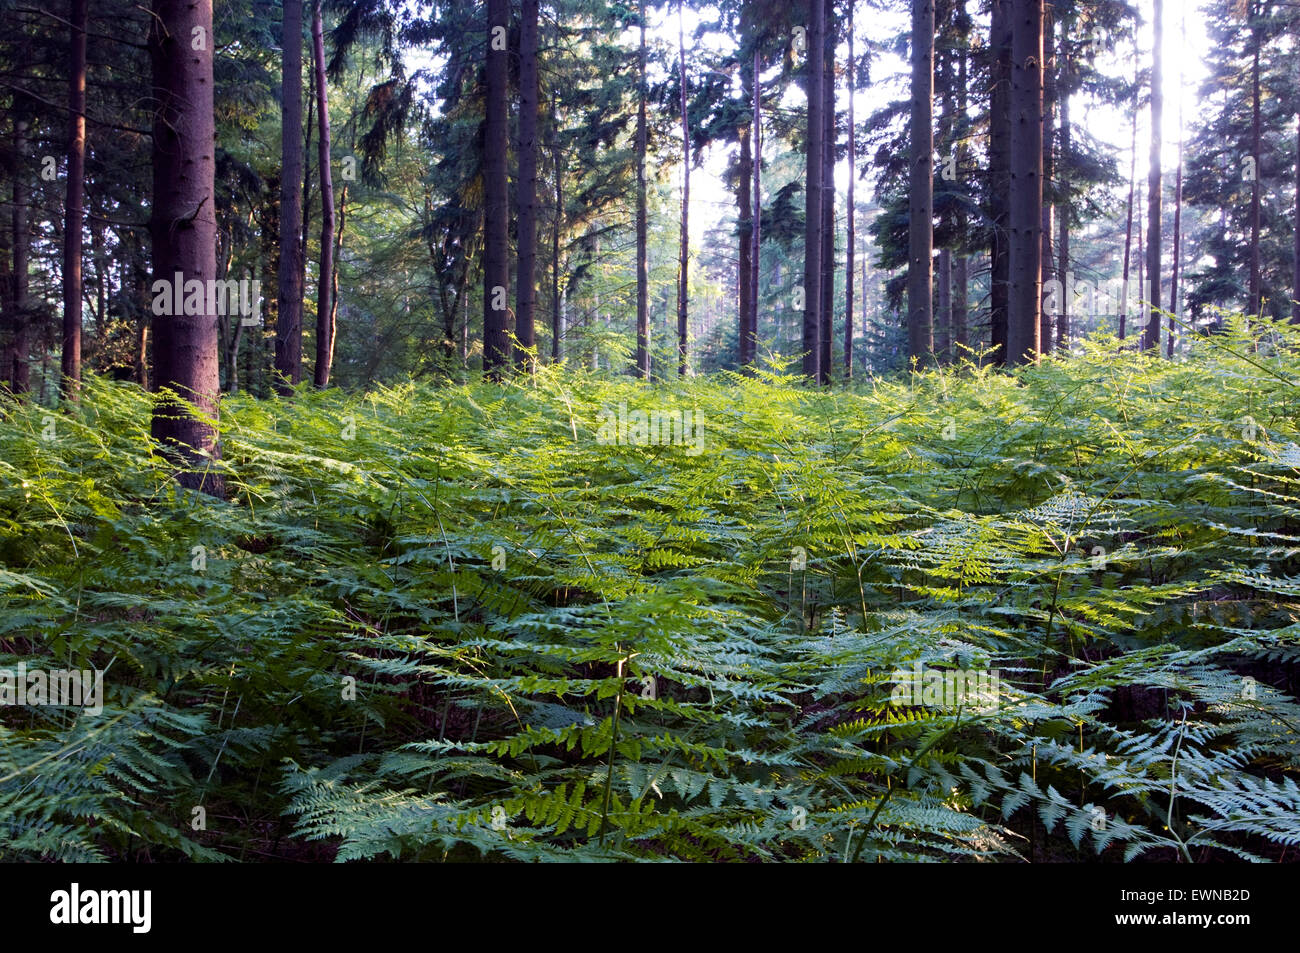 Conifer forest with fern(Osmunda regalis) - Stock Image